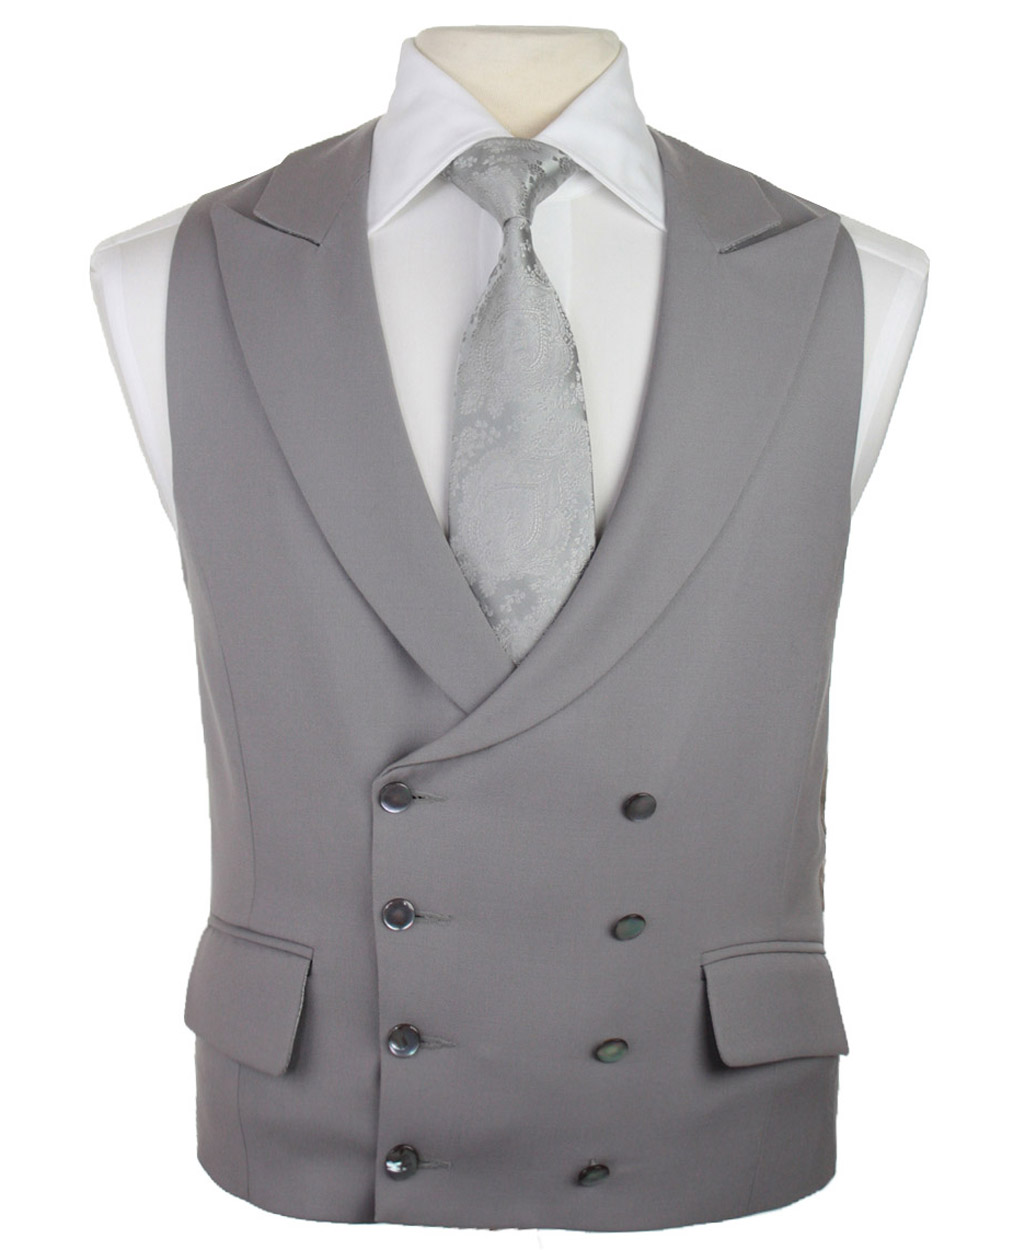 Double Breasted Waistcoats Vest Louis Tailor Pattaya